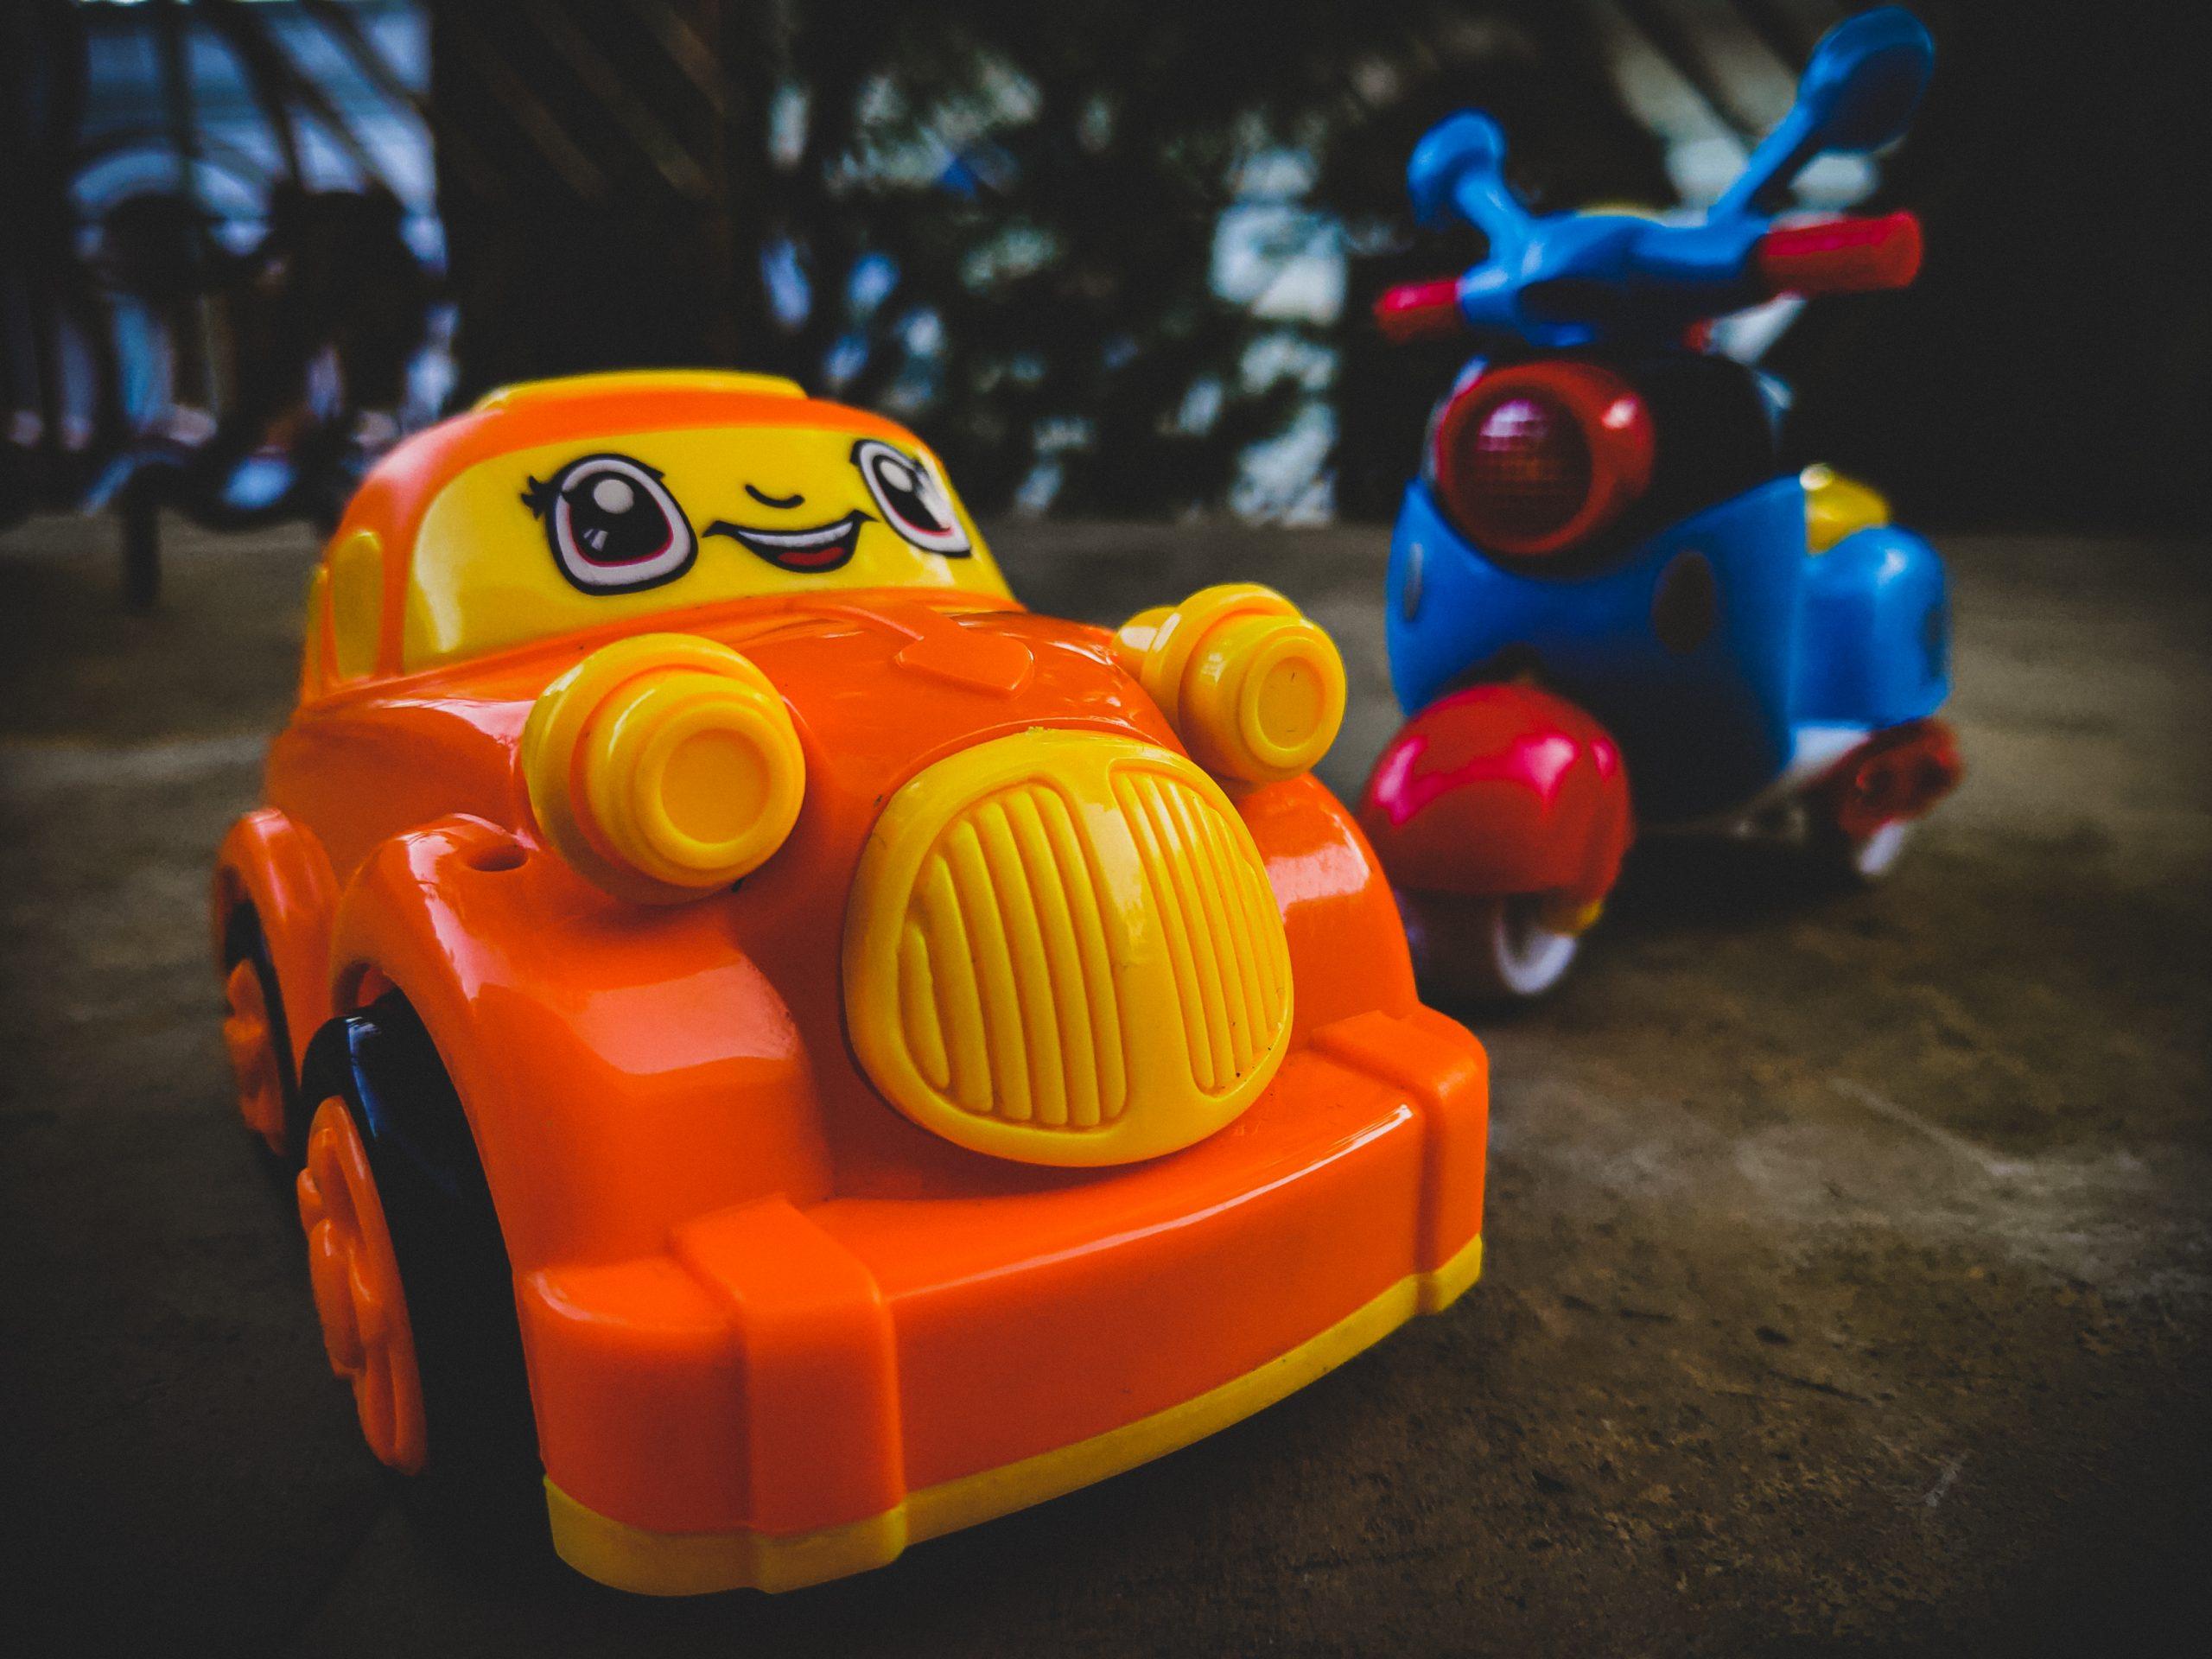 Miniature Car on Focus